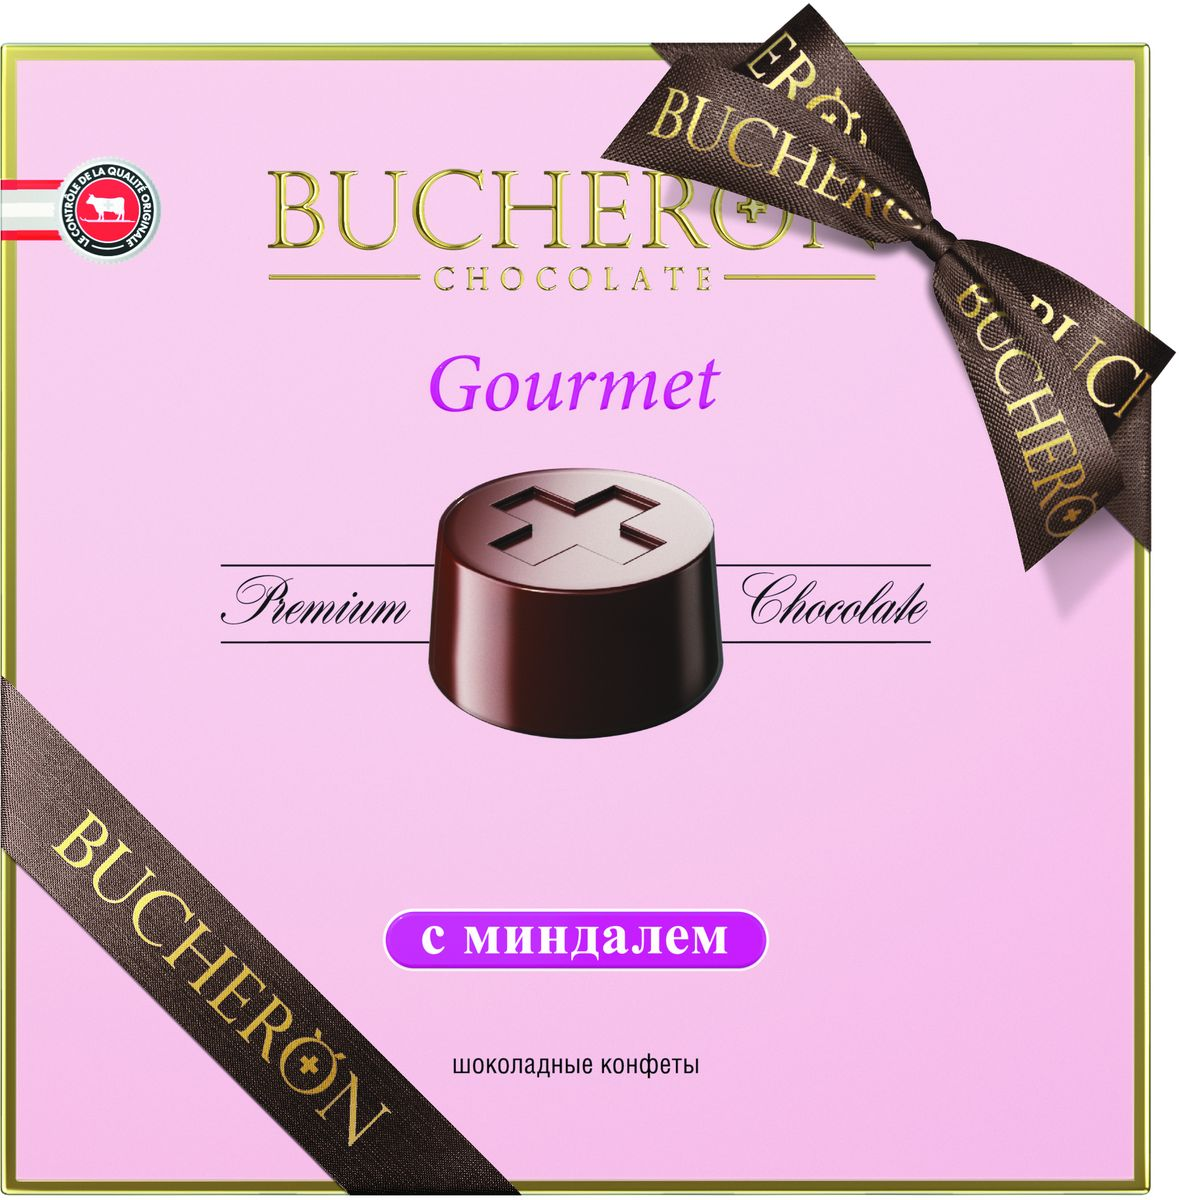 Bucheron Gourmet конфеты с миндалем, 180 г конфеты jelly belly 100g